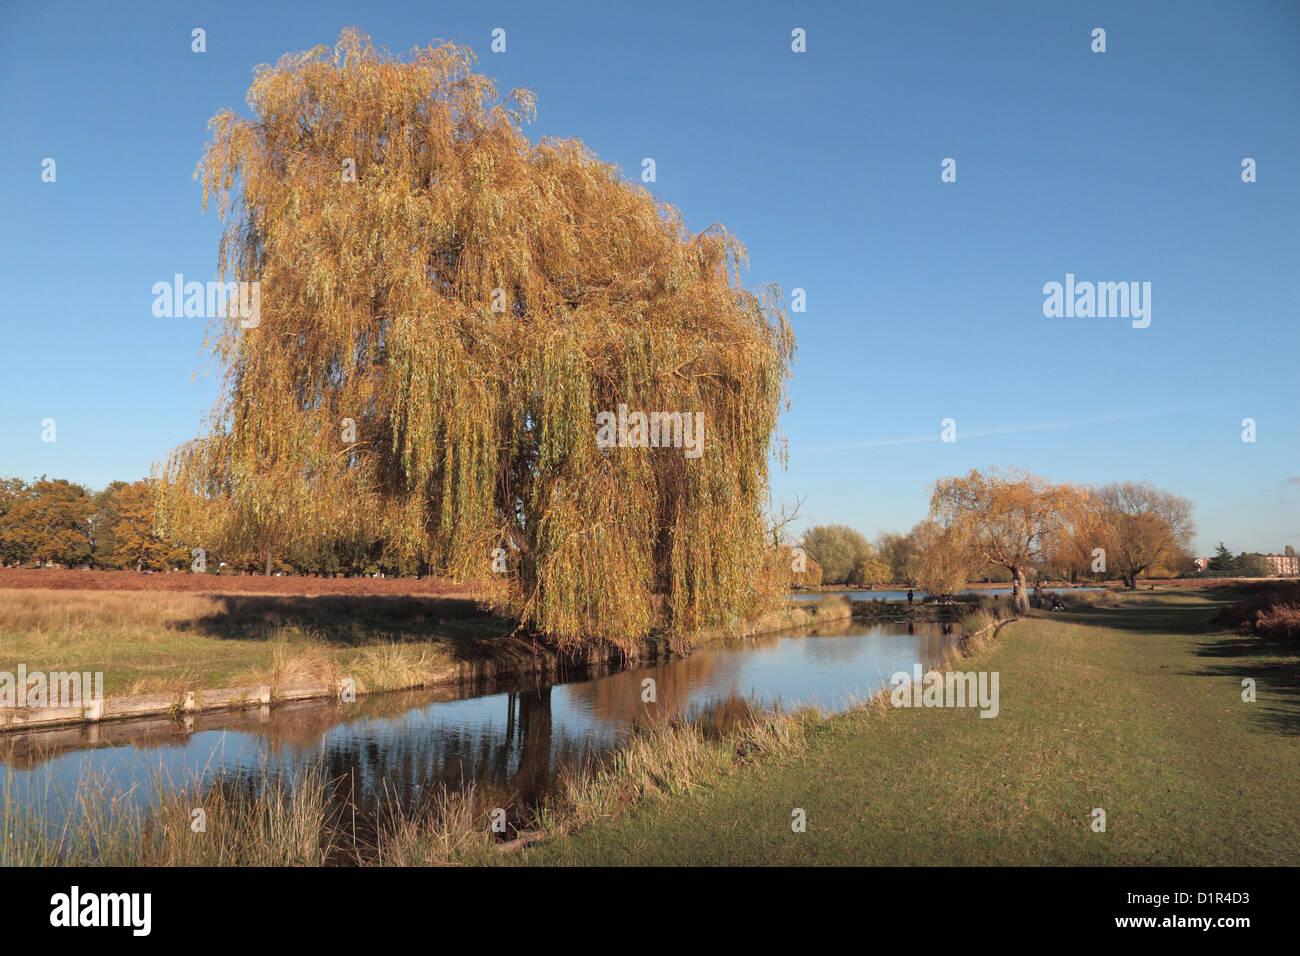 A weeping Willow (Salix babylonica) tree near Leg-of-Mutton Pond in Bushy Park, near Kingston, UK.  November 2012 - Stock Image